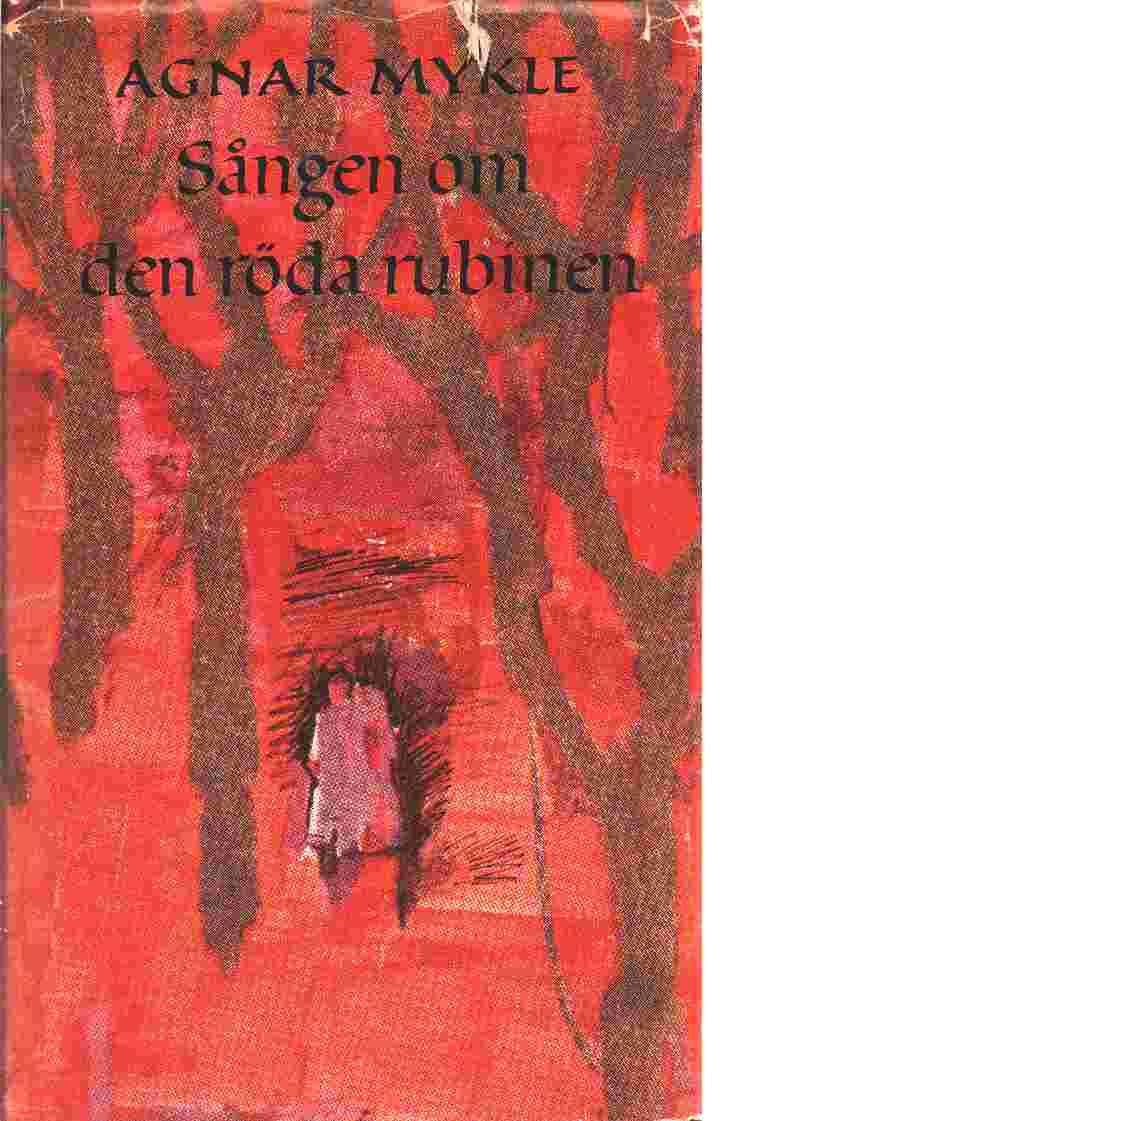 Sången om den röda rubinen - Mykle, Agnar